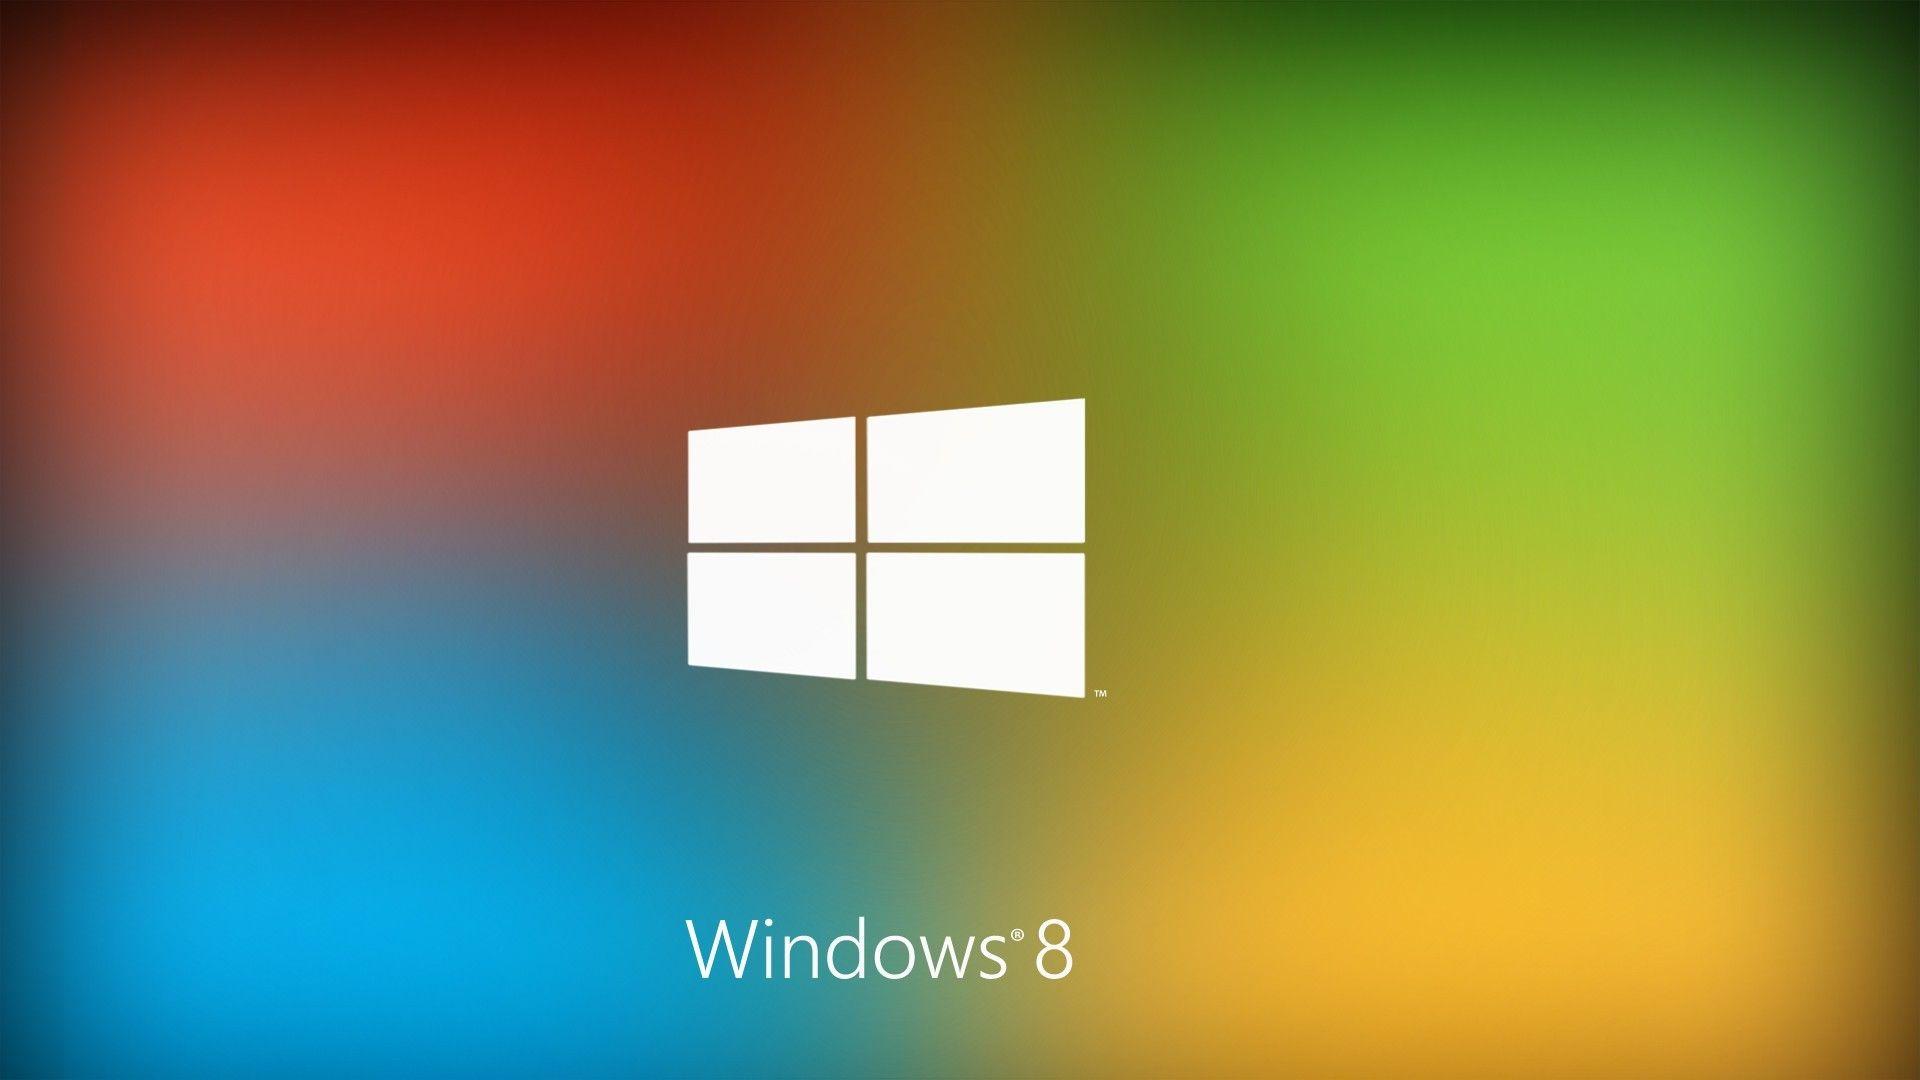 Full Hd P Windows Wallpapers Hd Desktop Backgrounds